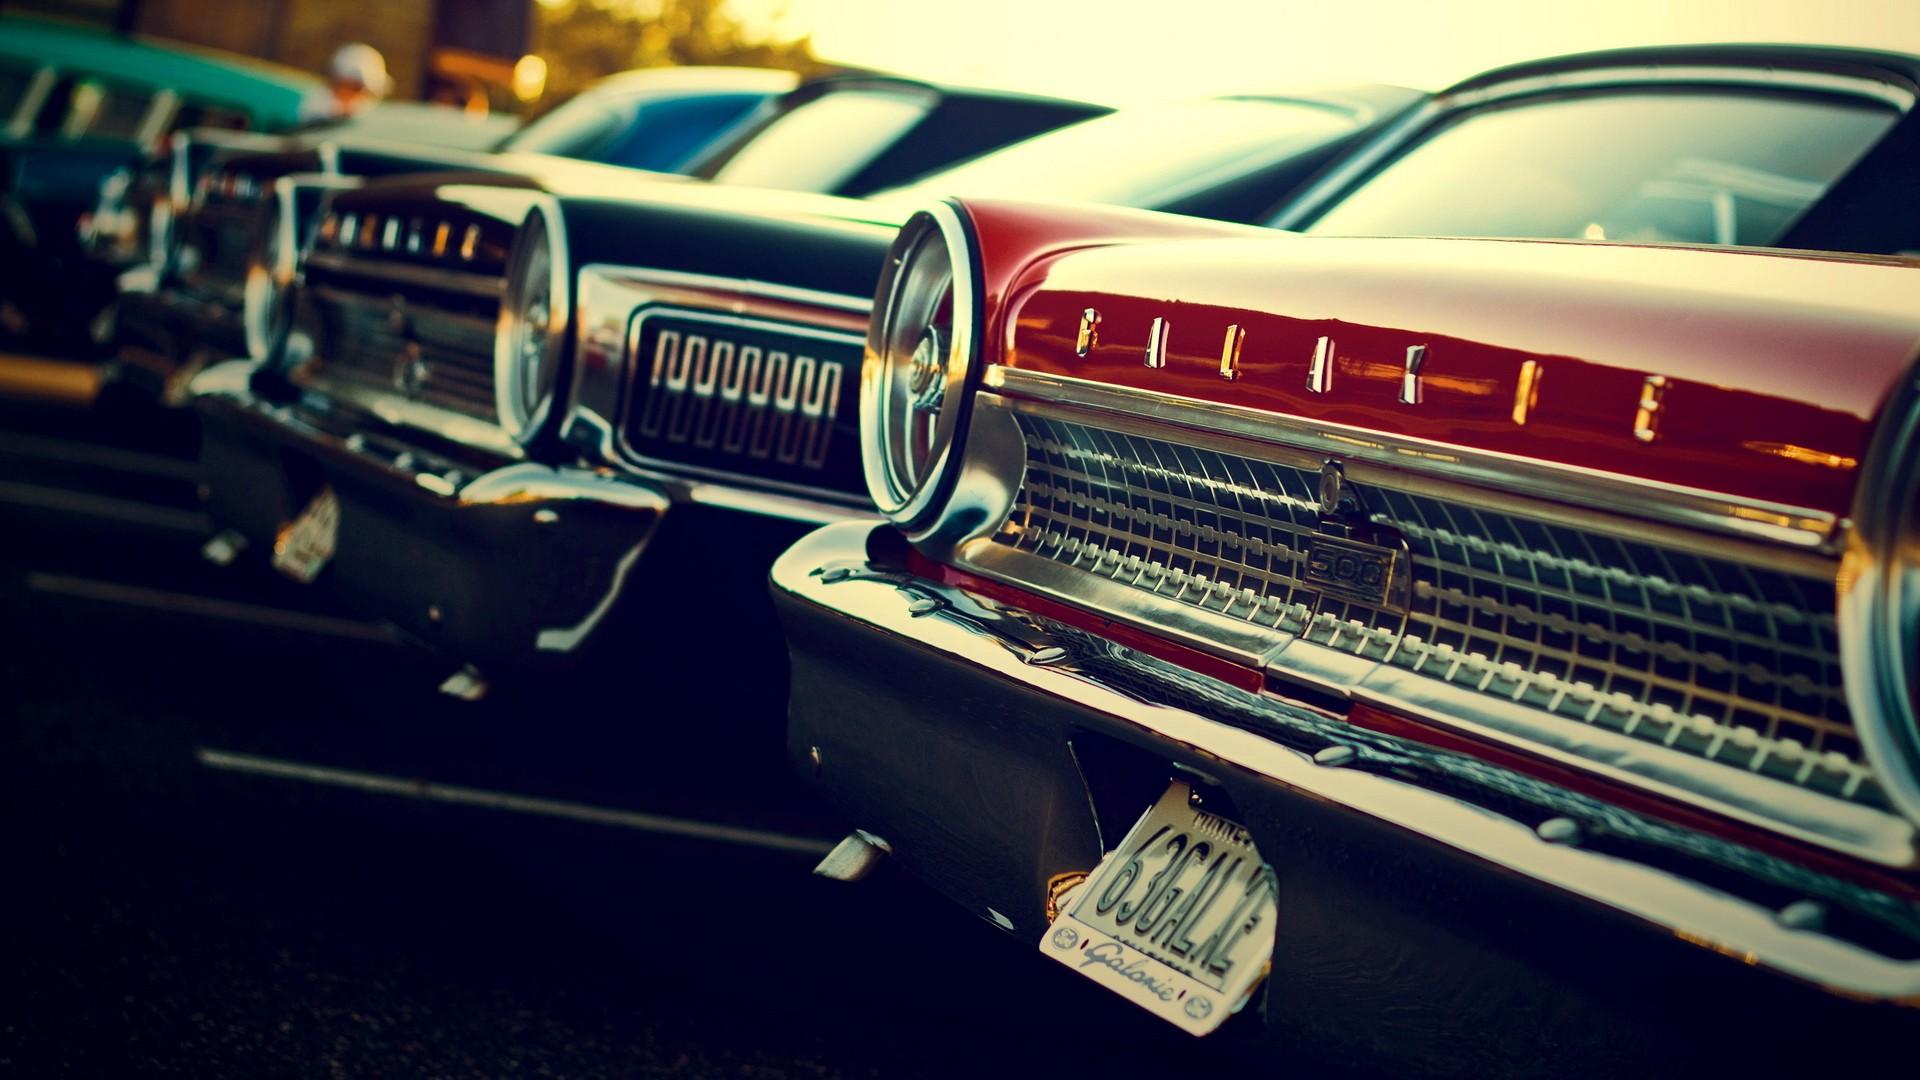 classic cars wallpaper 1920x1080 wallpapers hd 1080p desktop